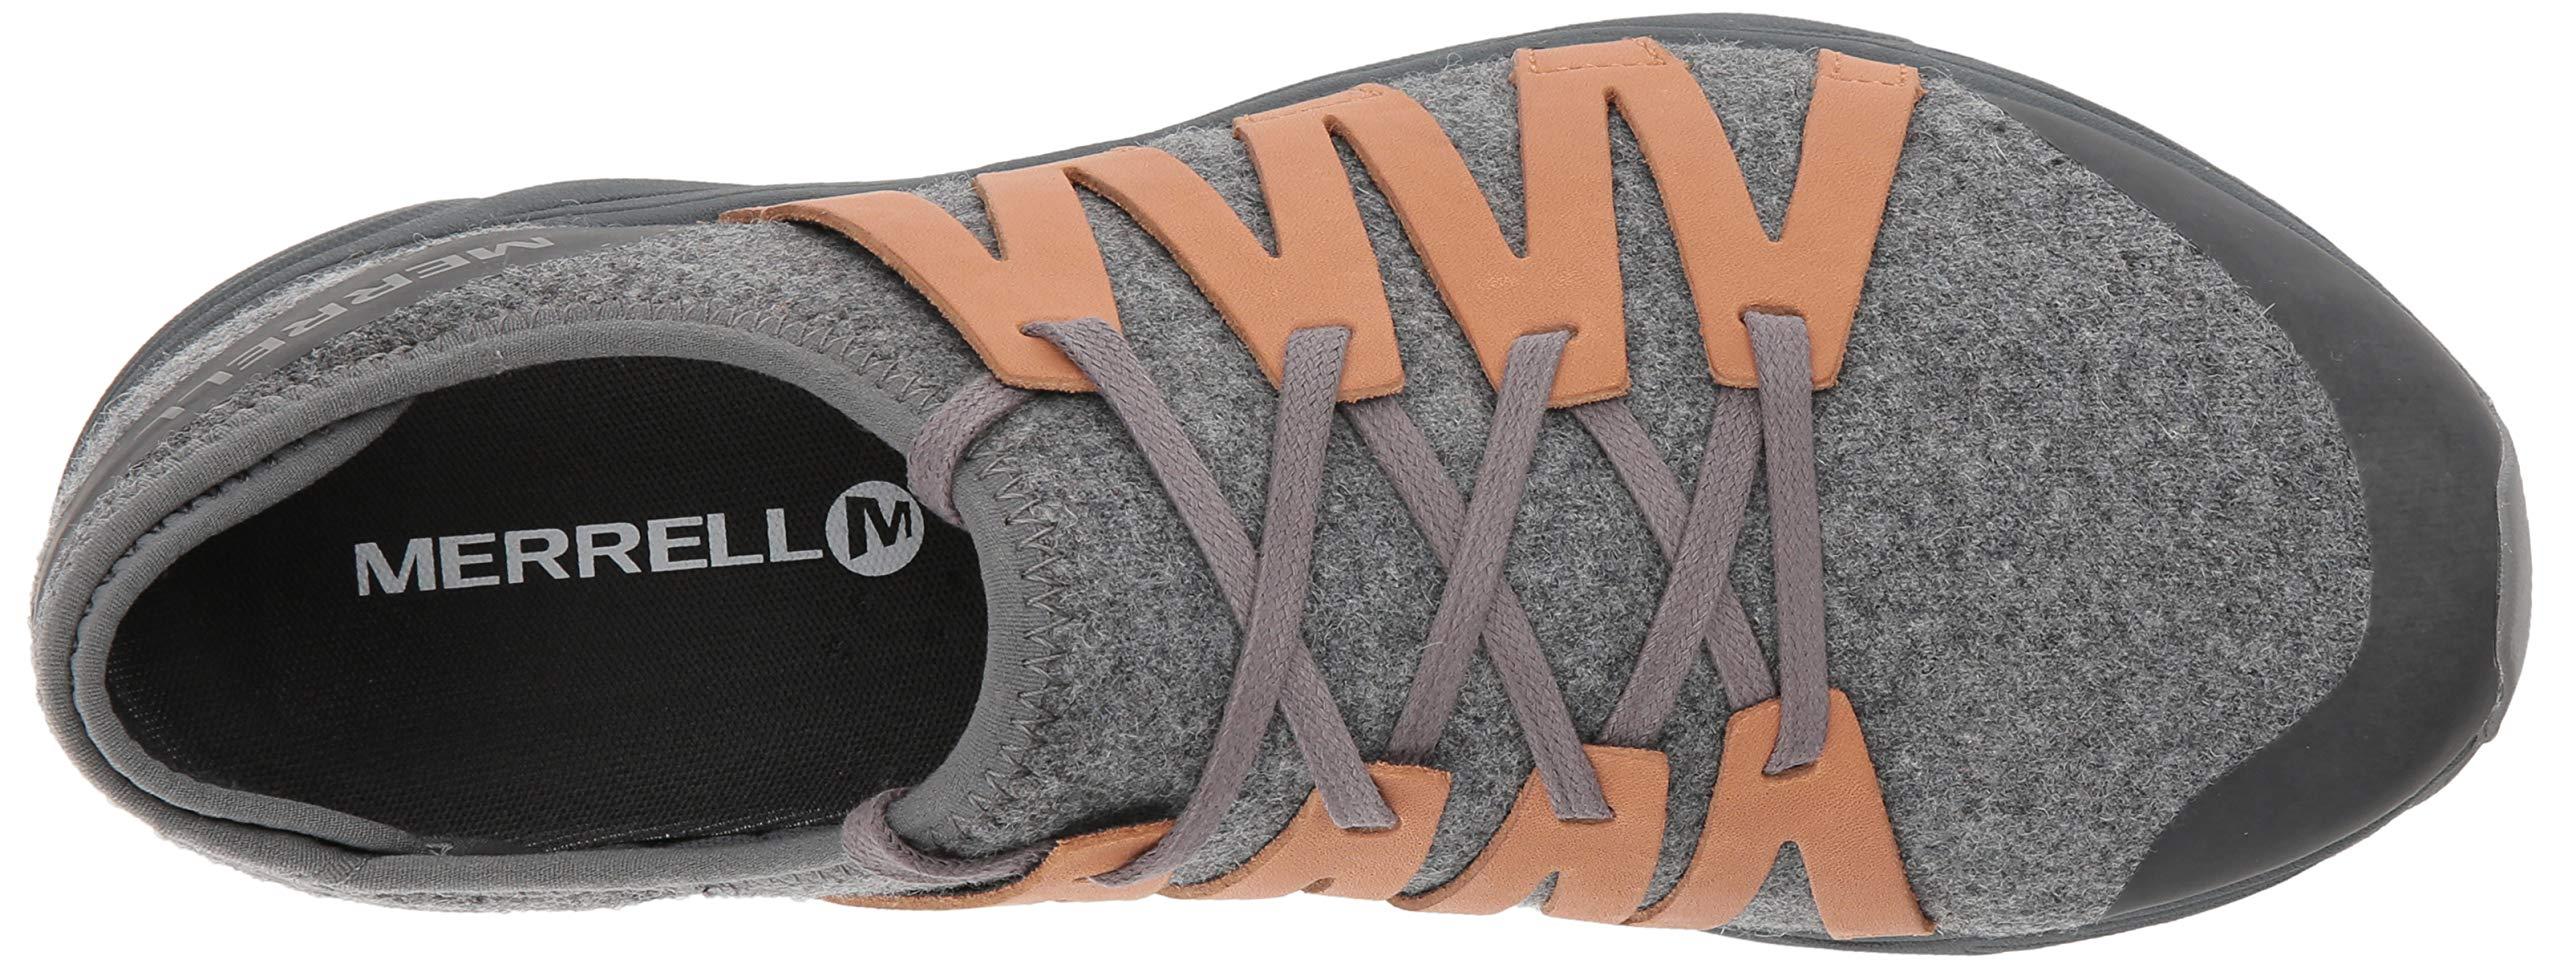 Merrell Women's Riveter Wool Sneaker Charcoal 8 M US by Merrell (Image #8)